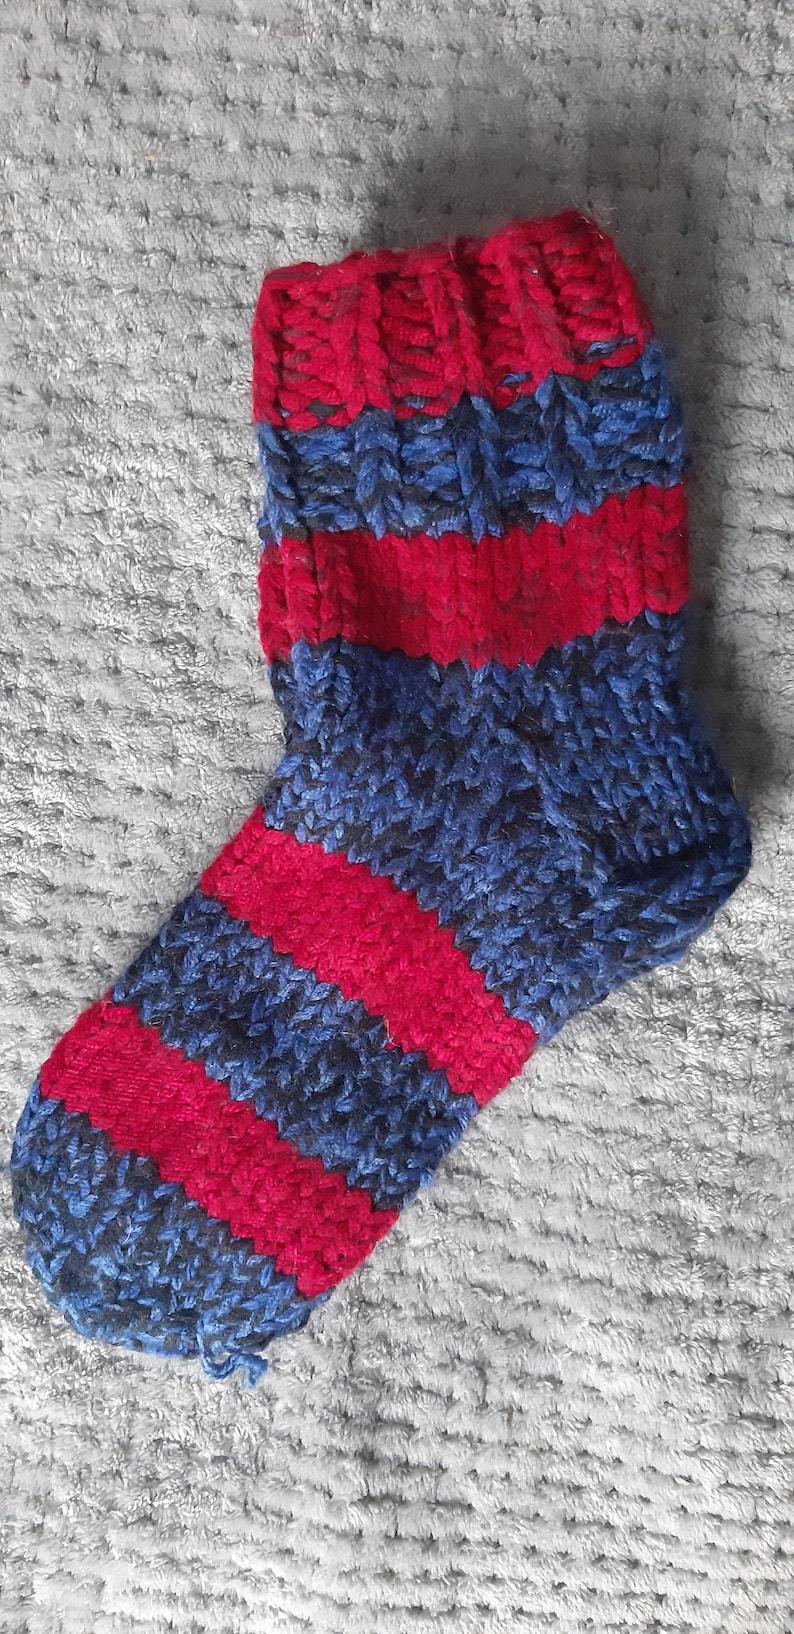 Size 39 eu 8 us Socks handknitted from natural wool and repurposed recycled yarn Warm socks 25 cm Winter socks Granny socks